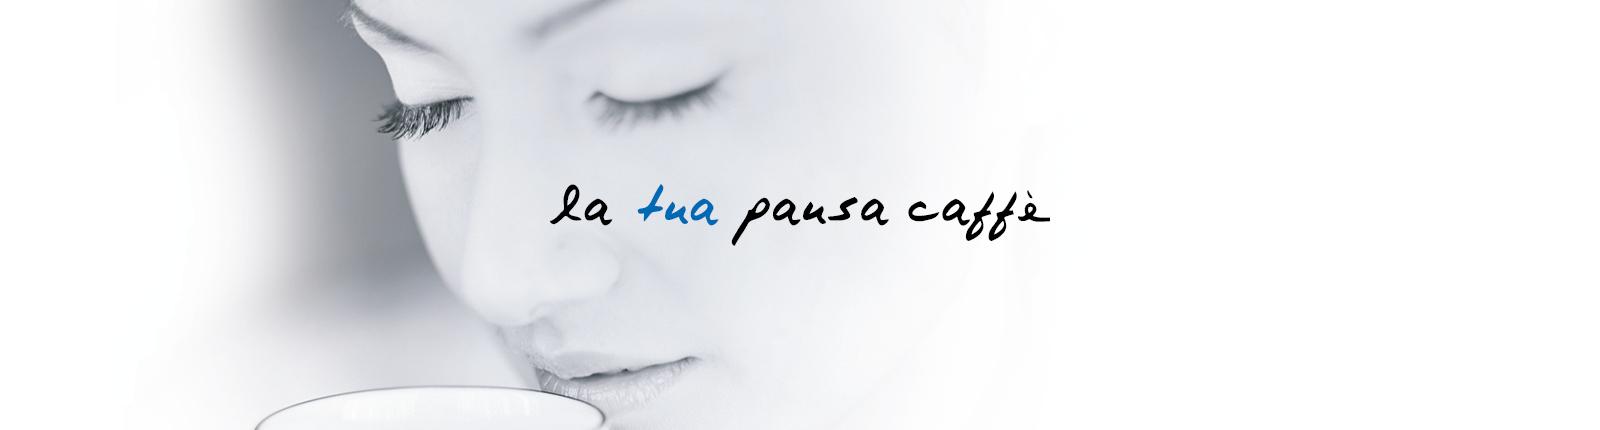 aesse-service-la-tua-pausa-caffe